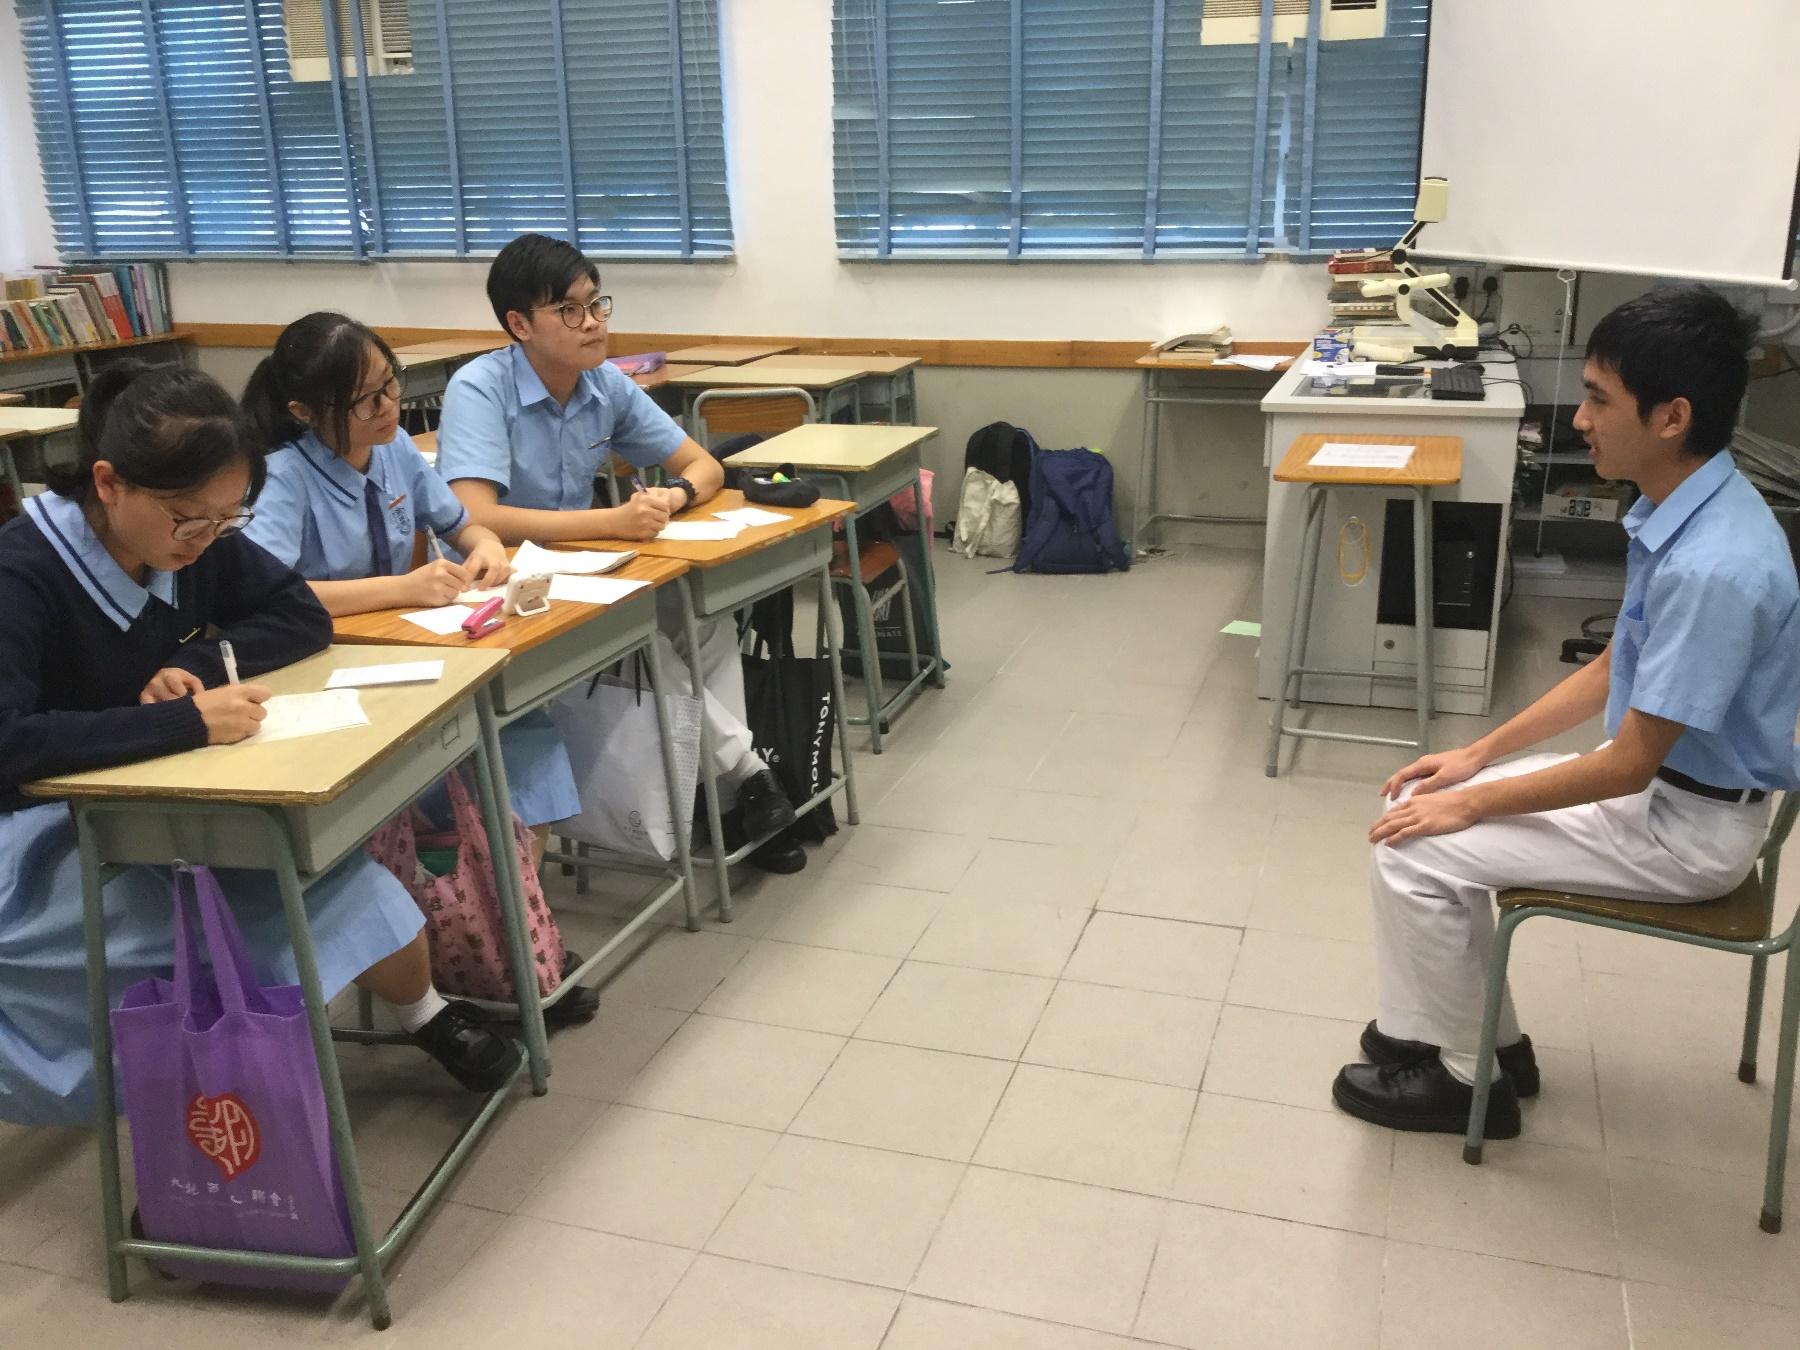 http://npc.edu.hk/sites/default/files/img_2060.jpg